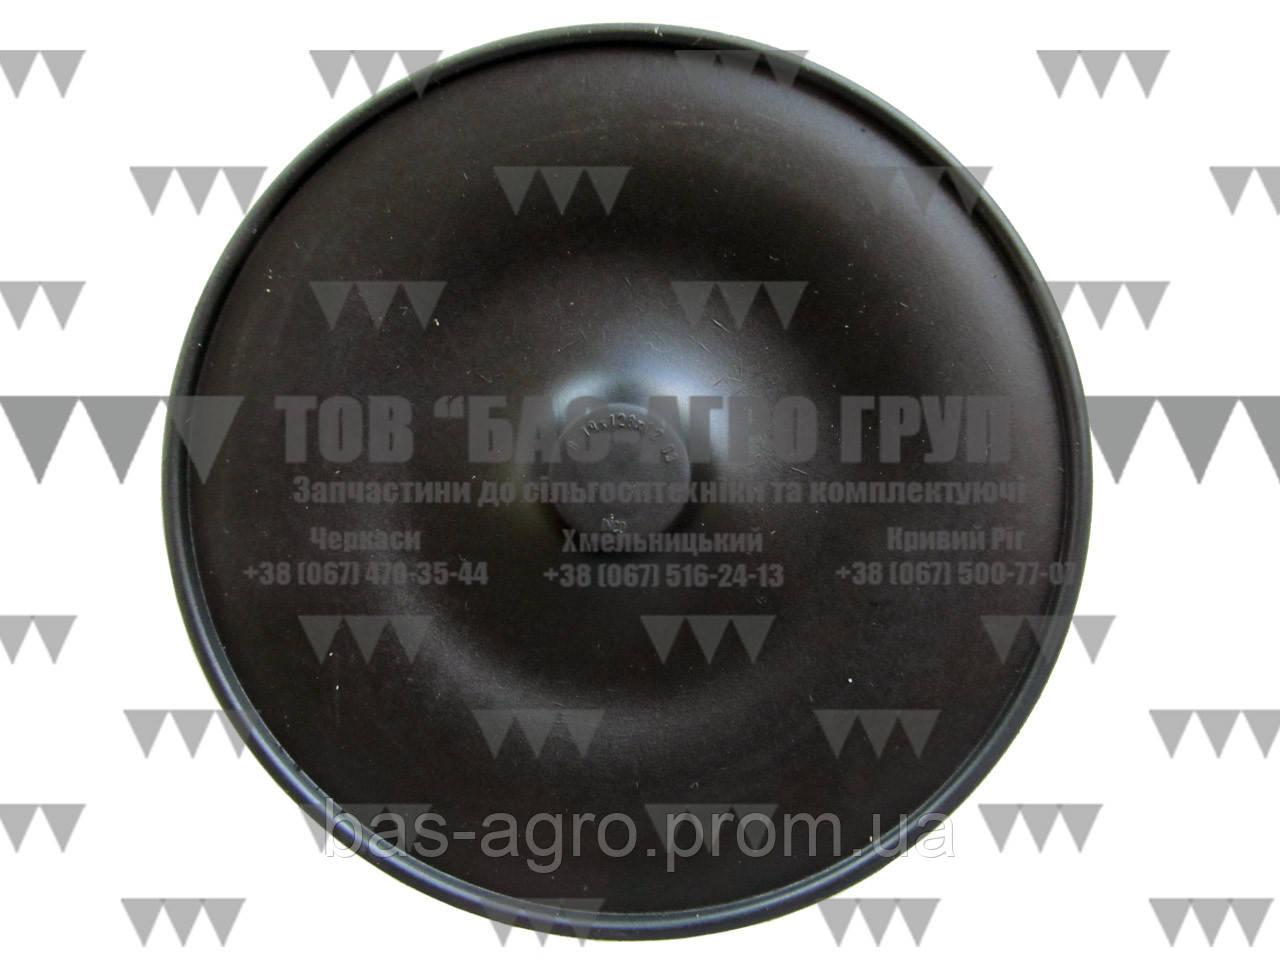 Мембрана насоса боковая В-19Х128Х12 (оригинал) TAD-LEN